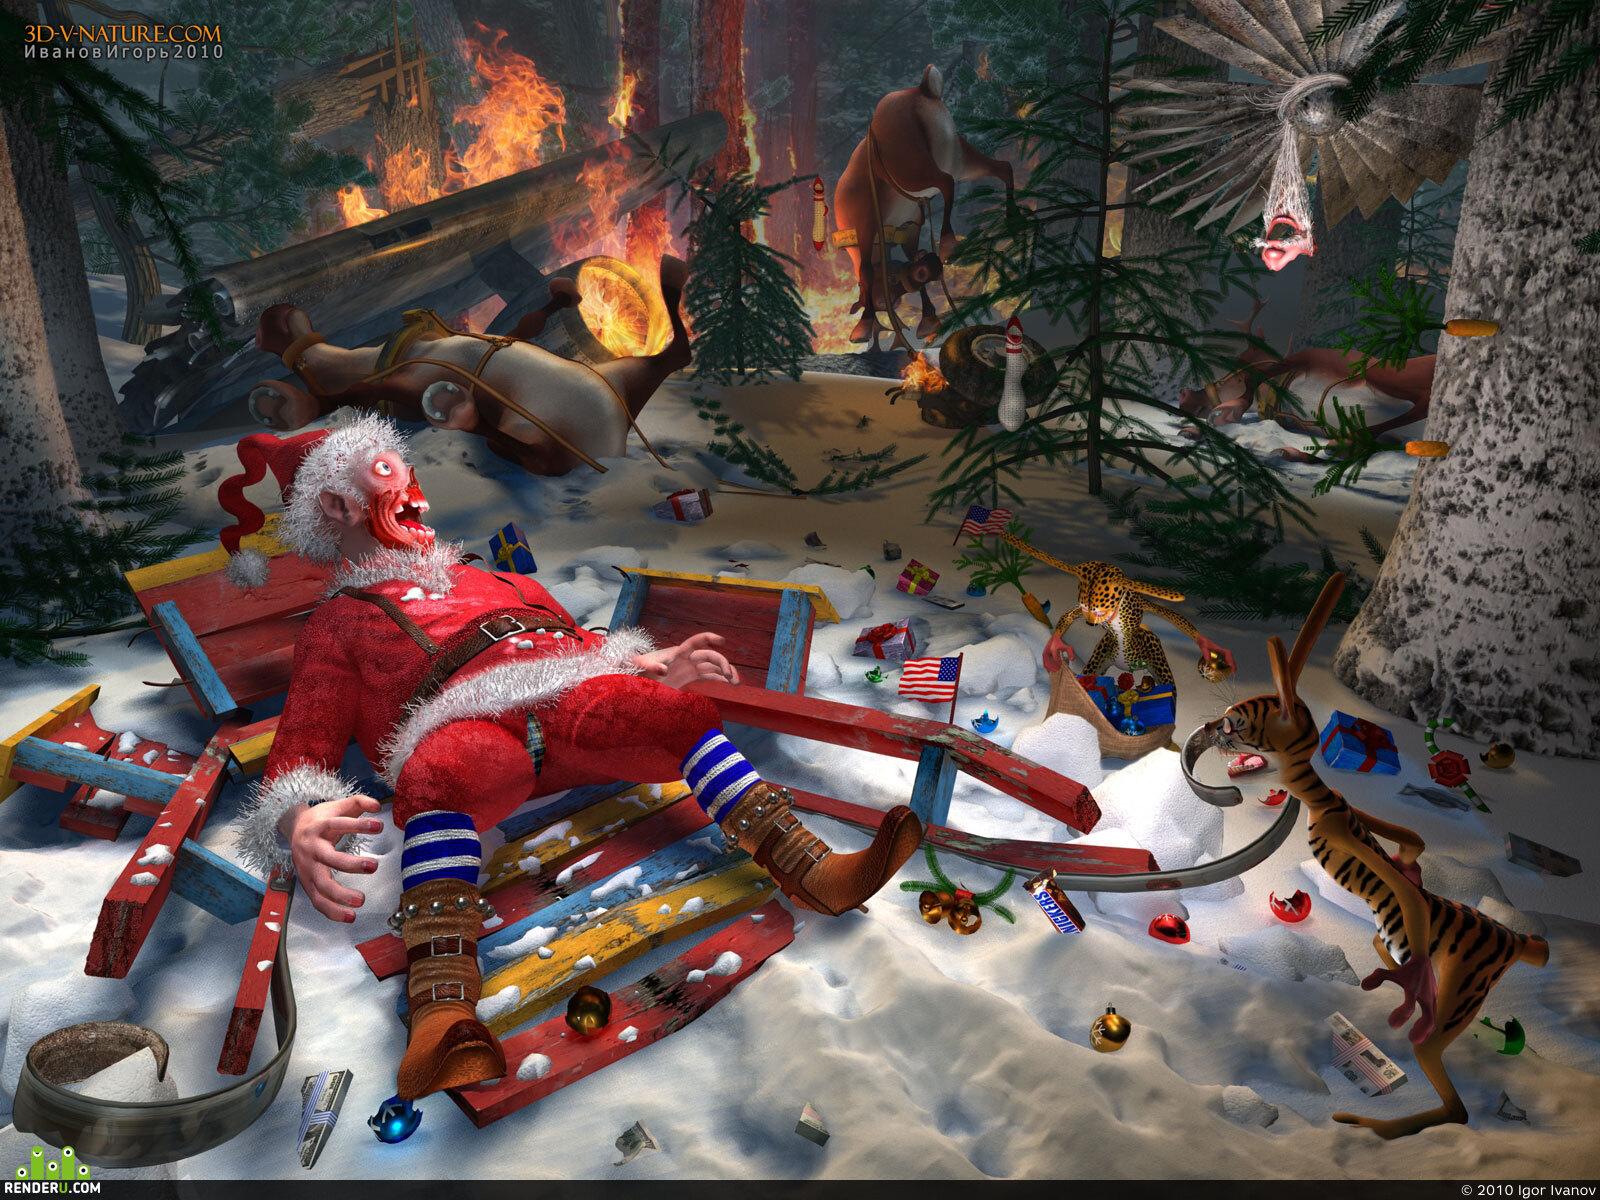 preview Jingle bells, jingle bells…